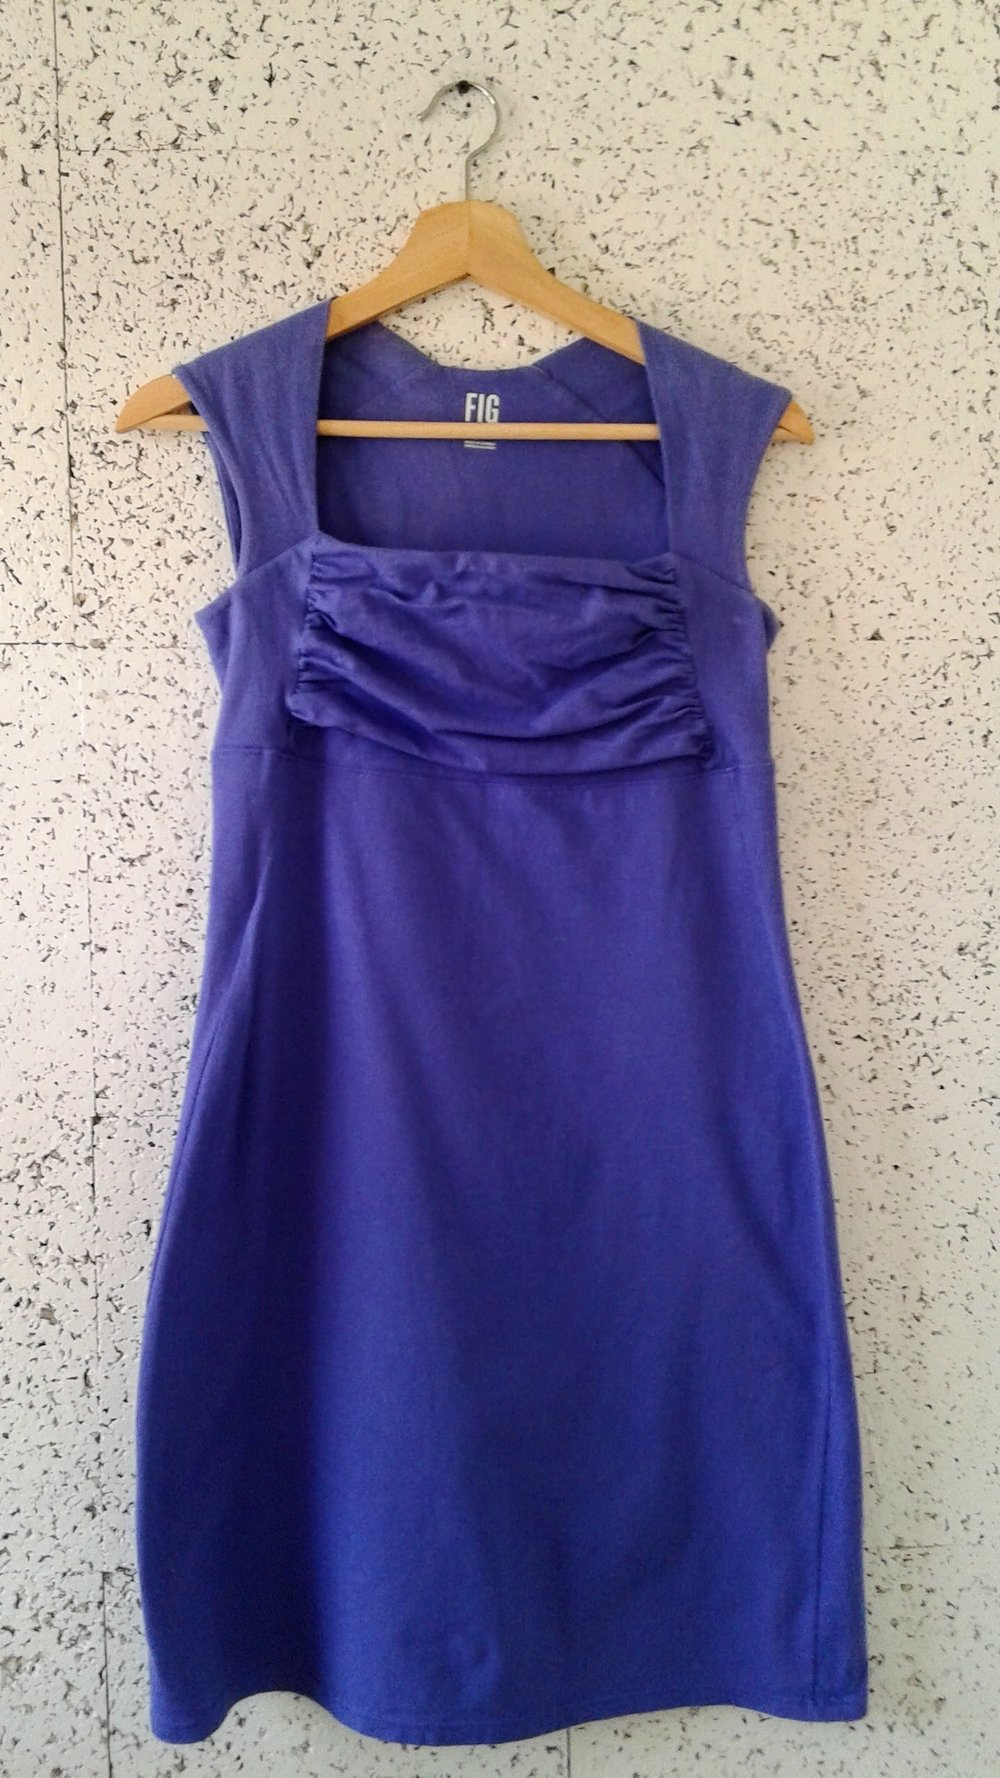 FIG dress; Size M, $24